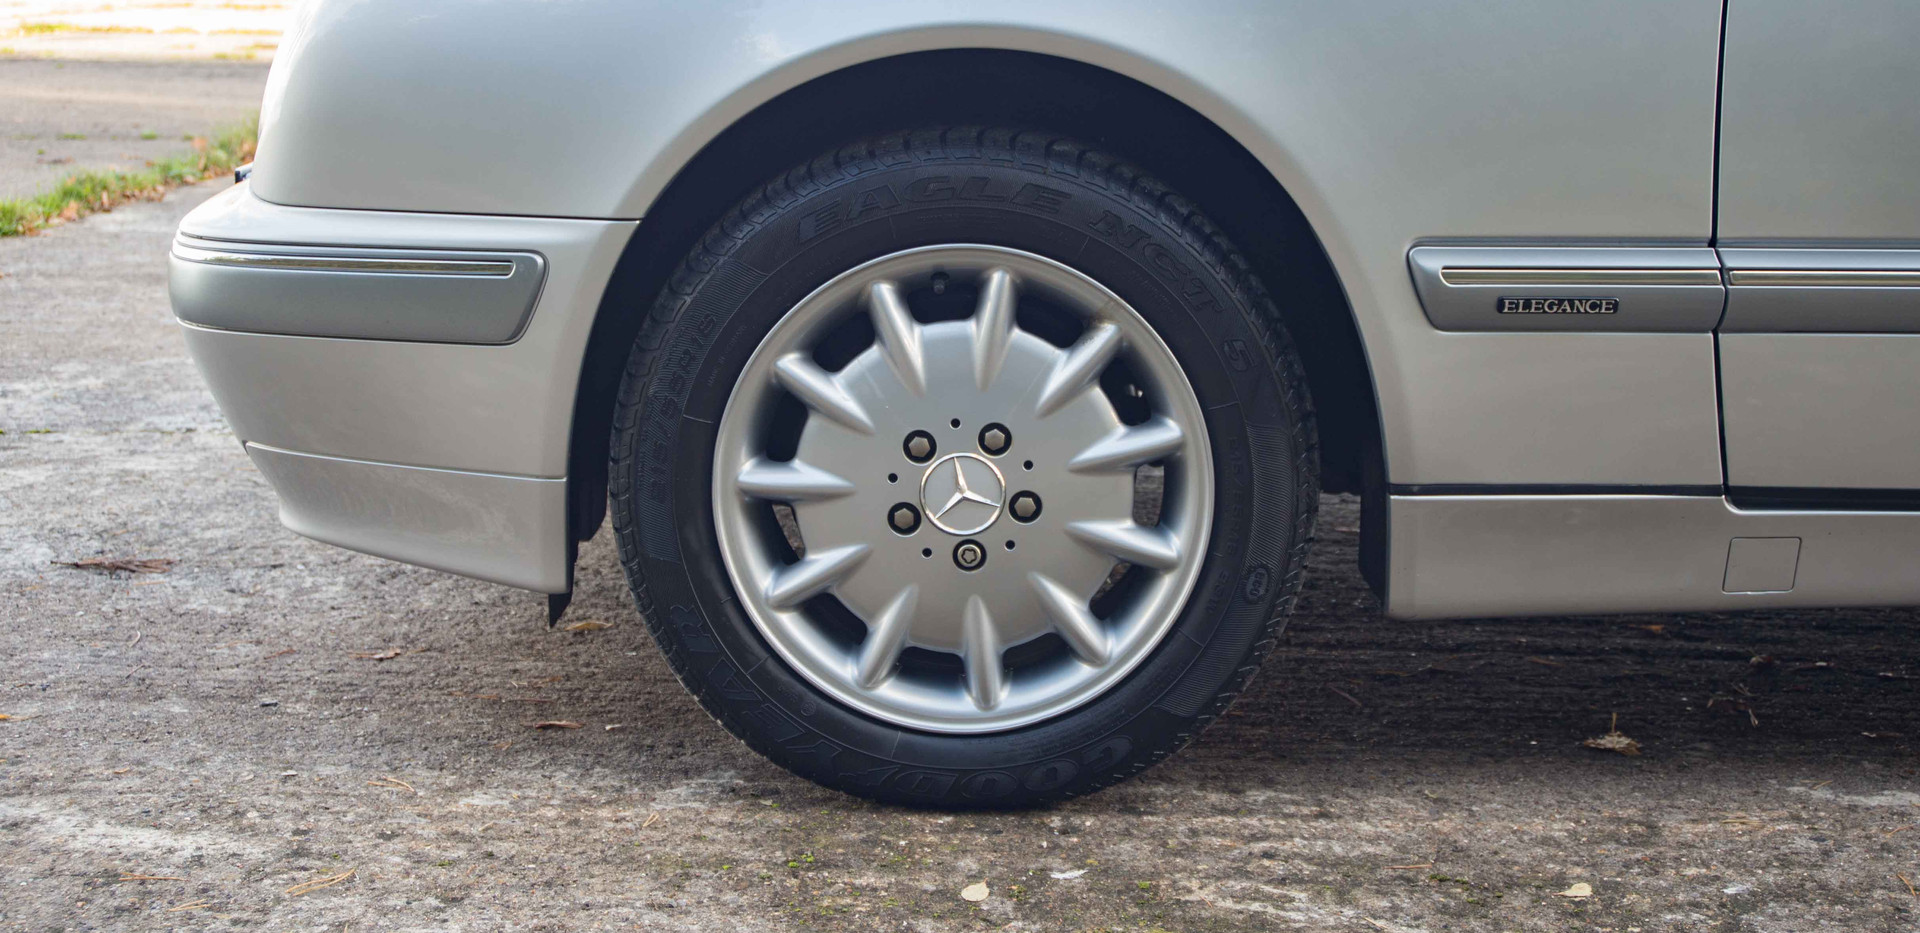 Mercedes E240 For Sale UK London  (45 of